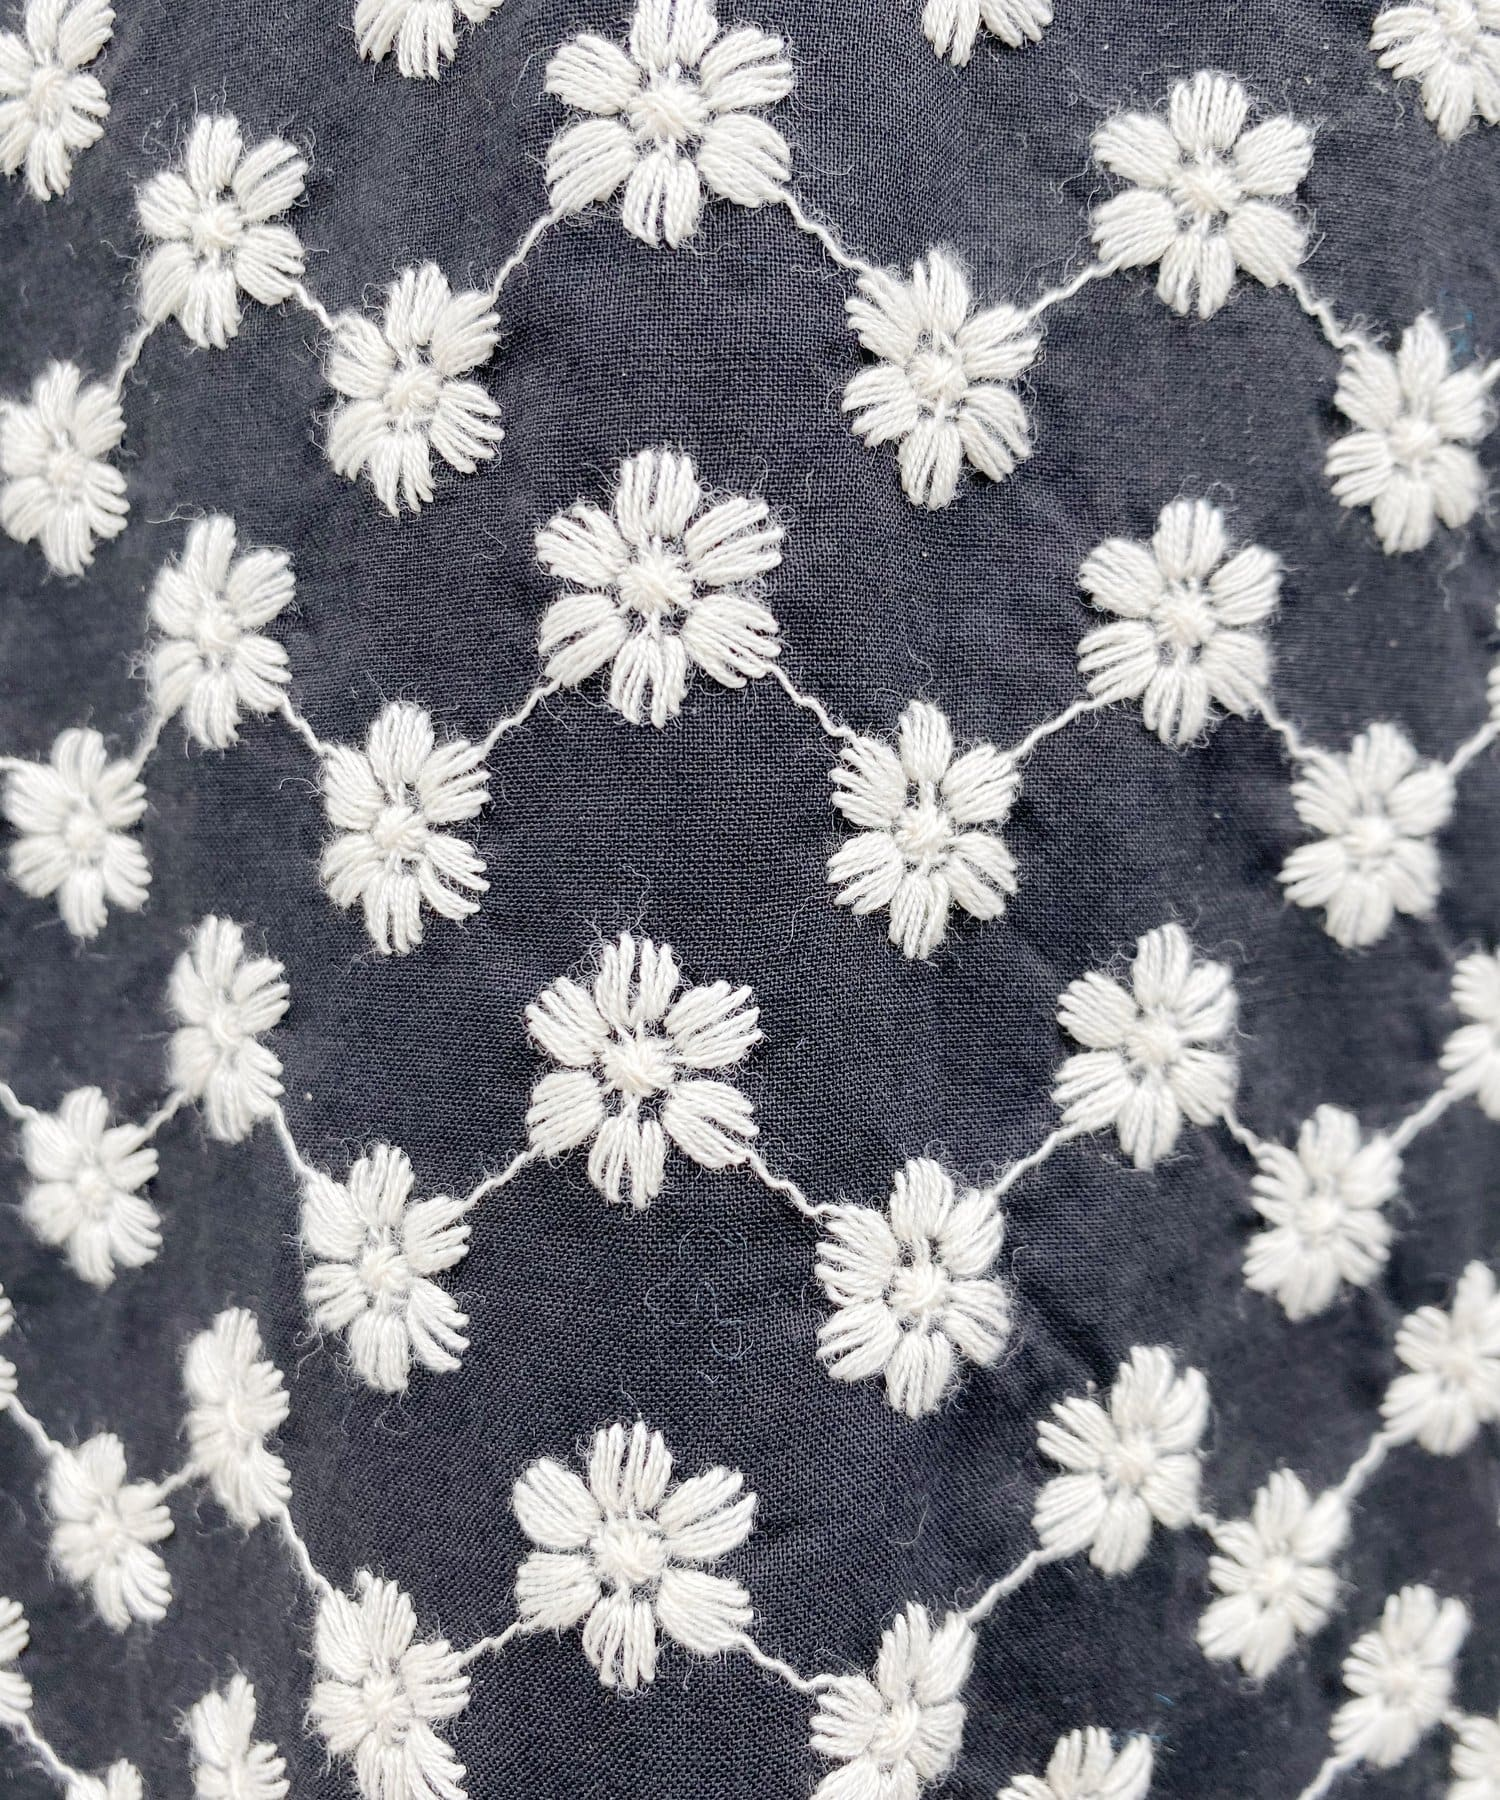 SHENERY(シーナリー) 【WEB限定】ギャザーパフスリーブ刺繍チュニックドレス